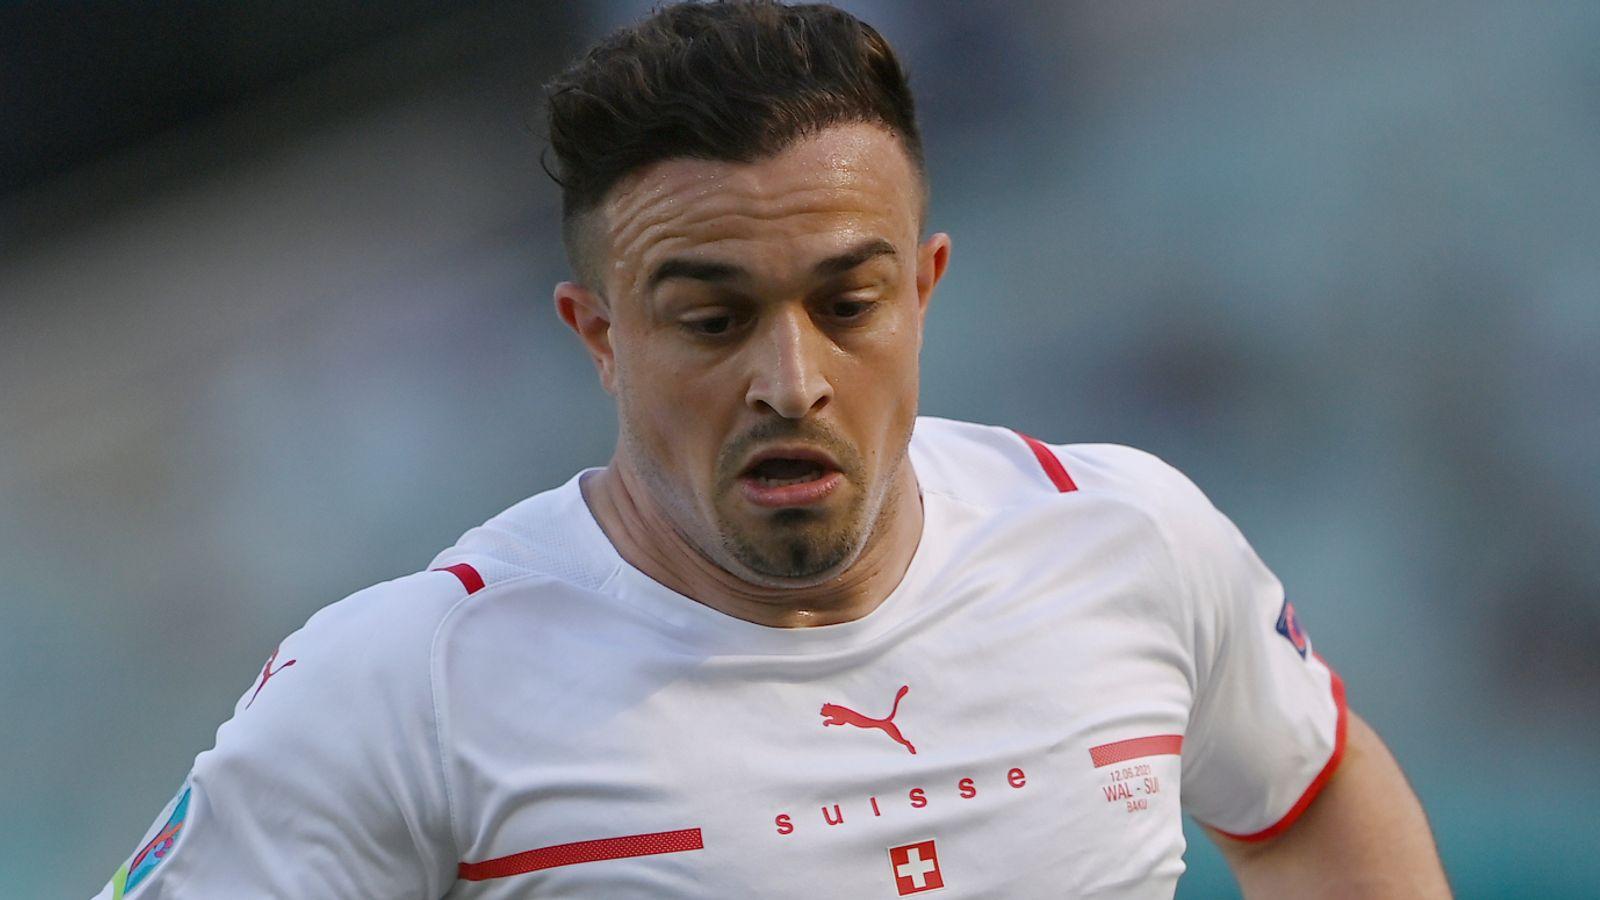 Liverpool transfer news: Reds put £12.75m price tag on Xherdan Shaqiri